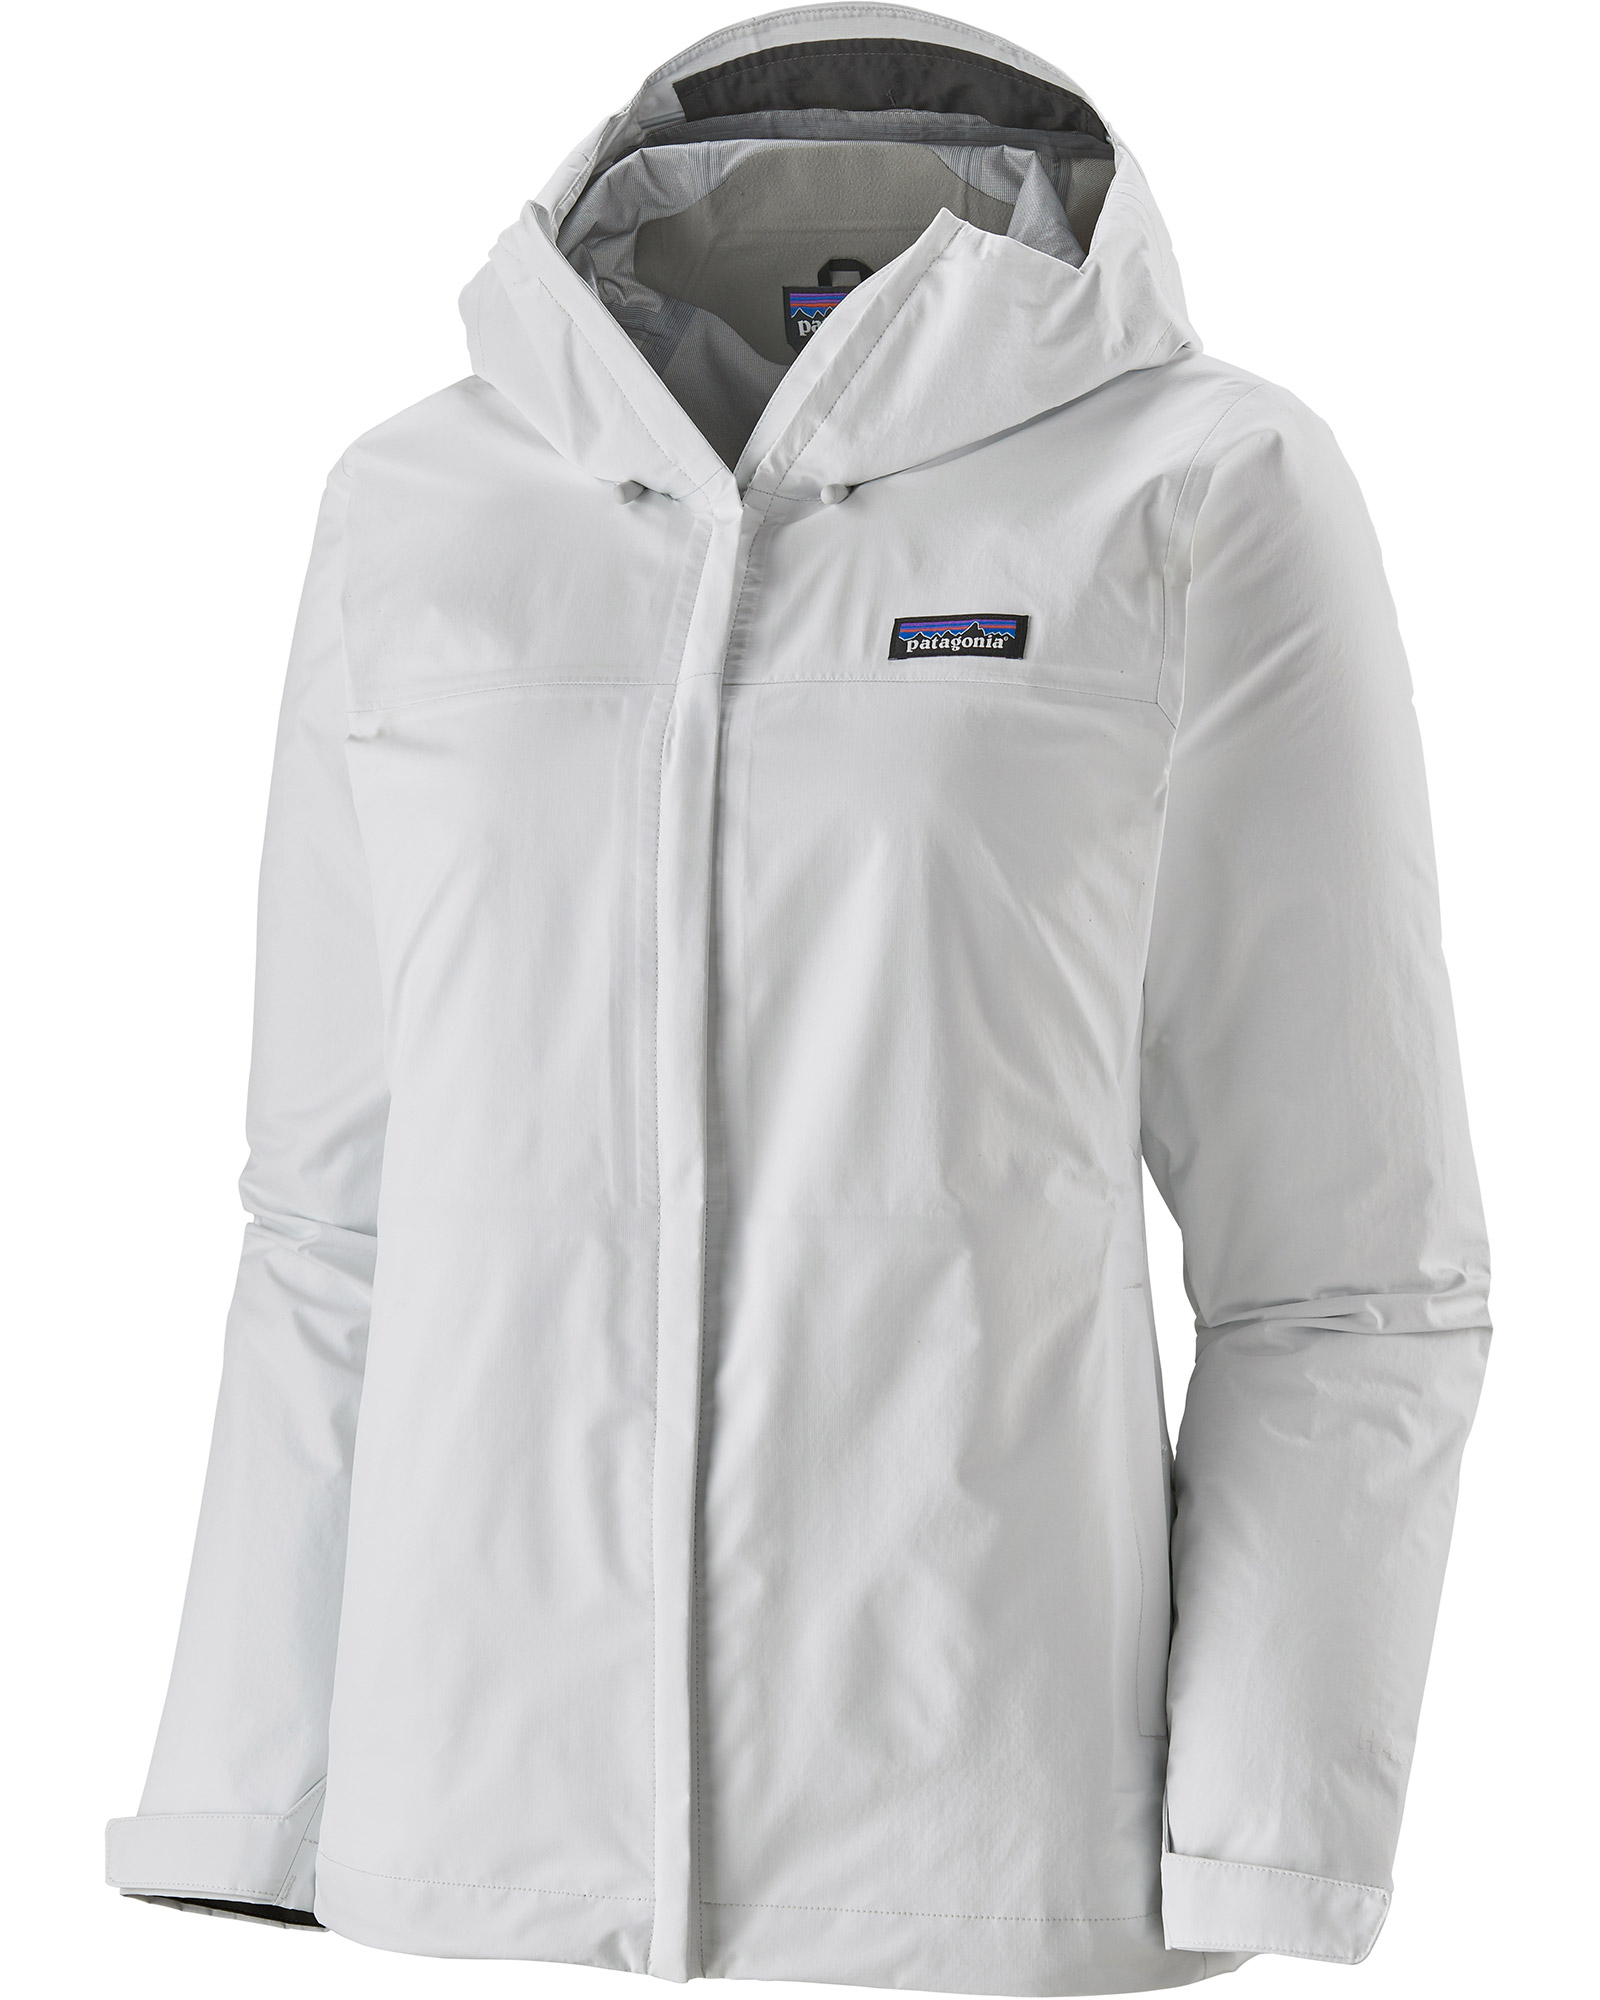 Patagonia Torrentshell 3L Women's Jacket 0